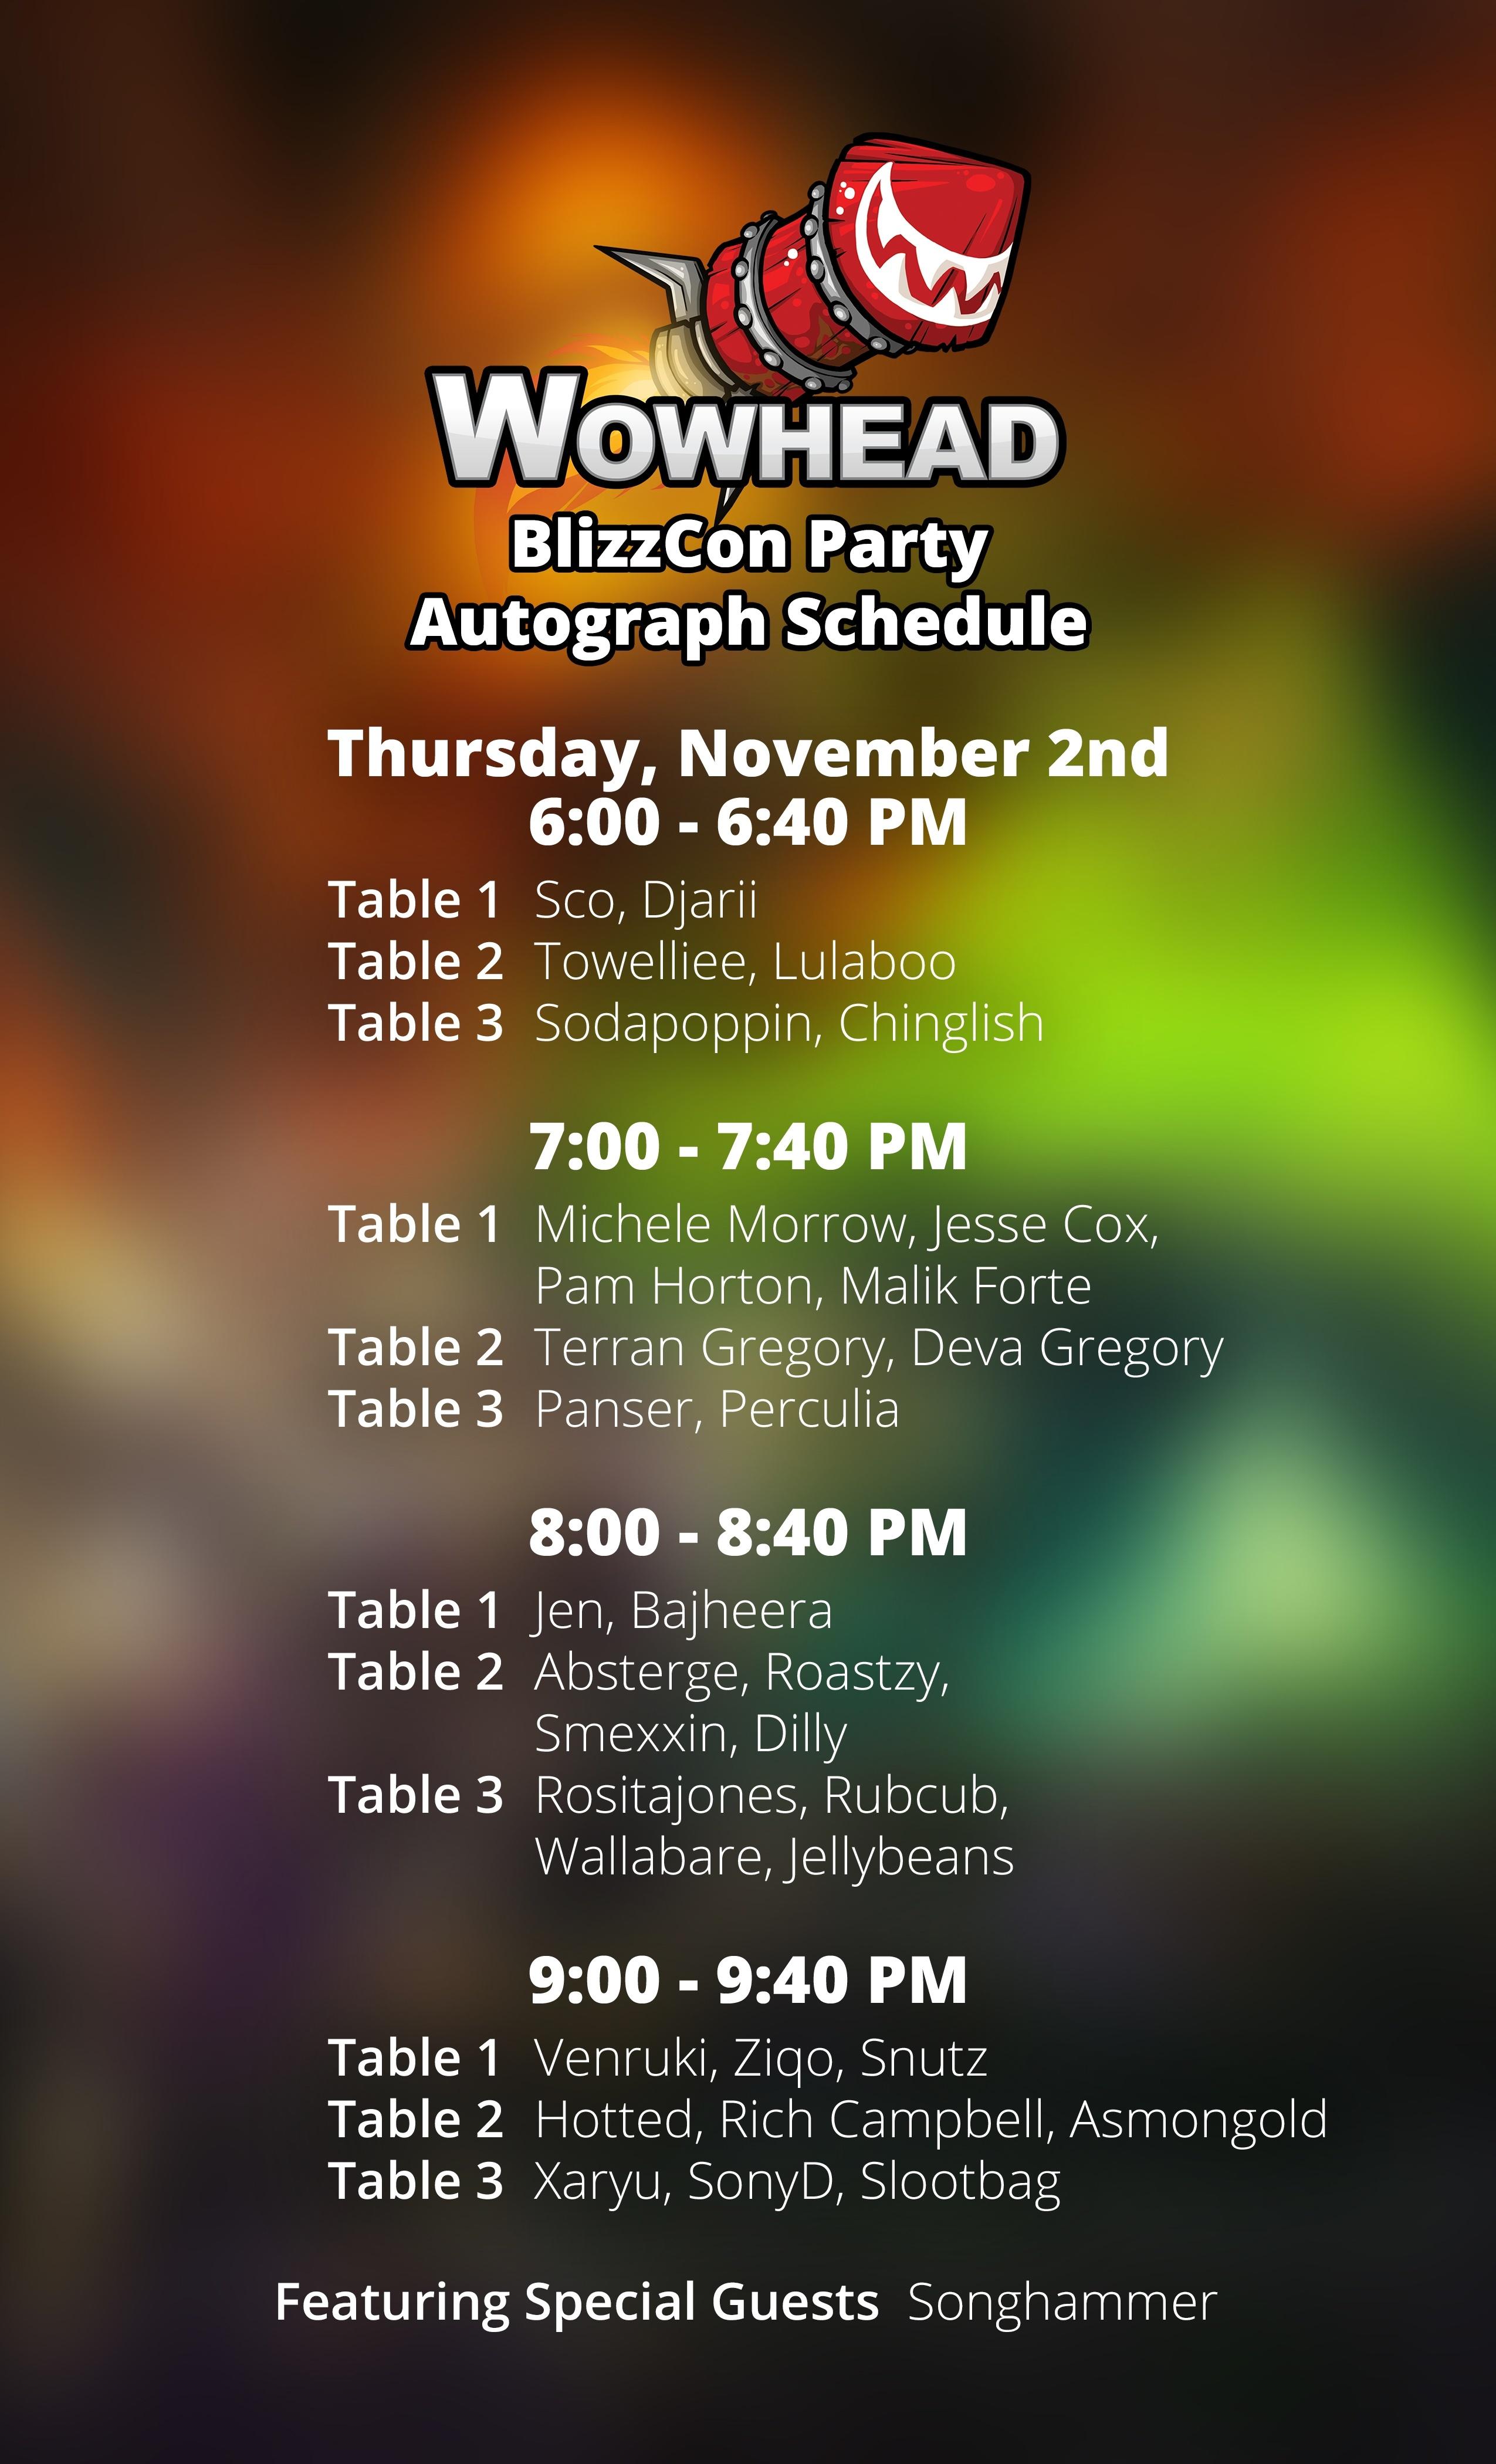 Wowhead Blizzcon 2017 Party Meet And Greet Wowhead News